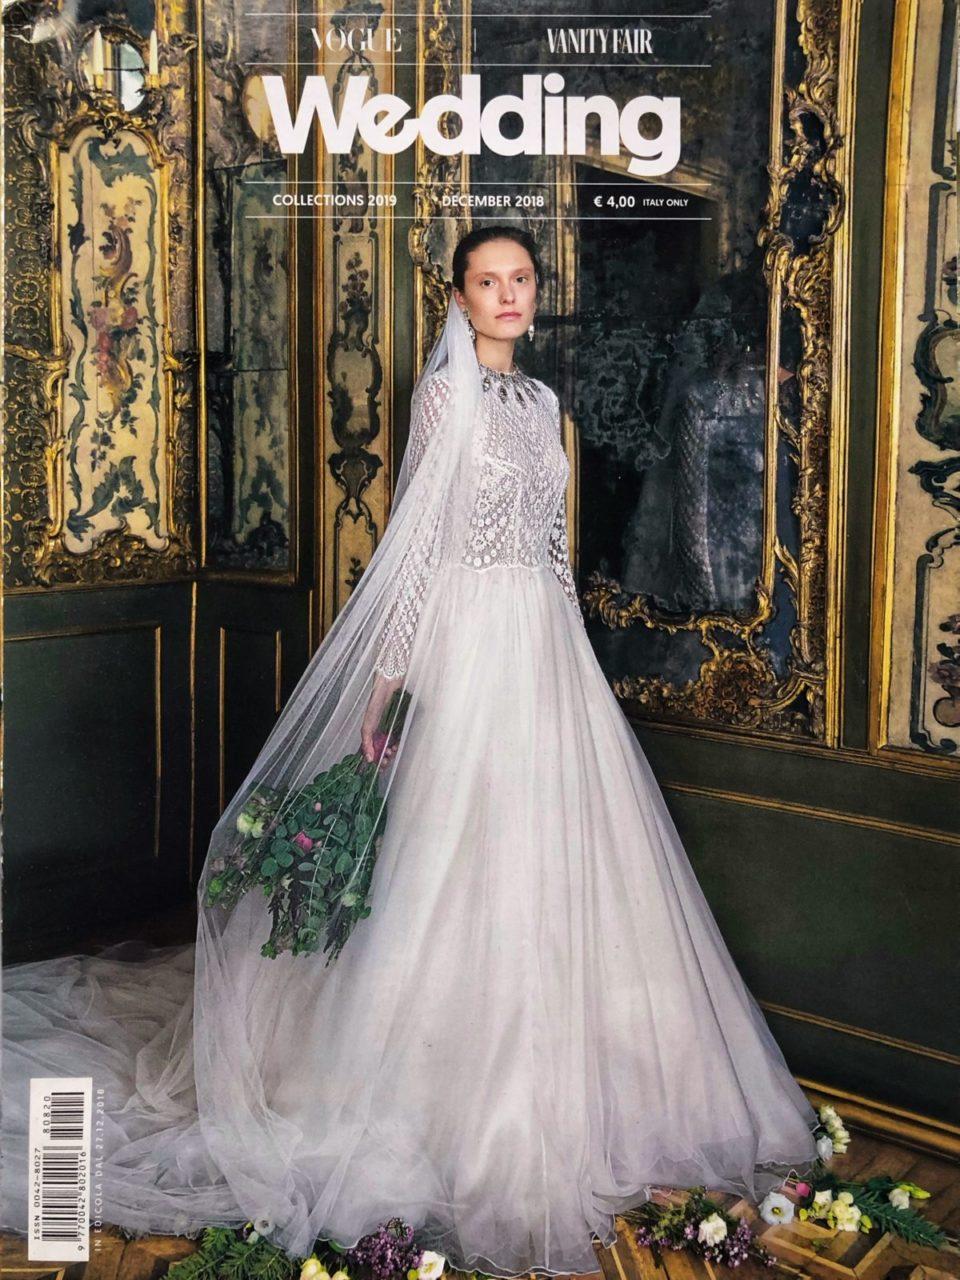 2C129308 C26B 4687 A993 D610FBC38698 - Ending year with a publication on Wedding Vogue Vanity Fair